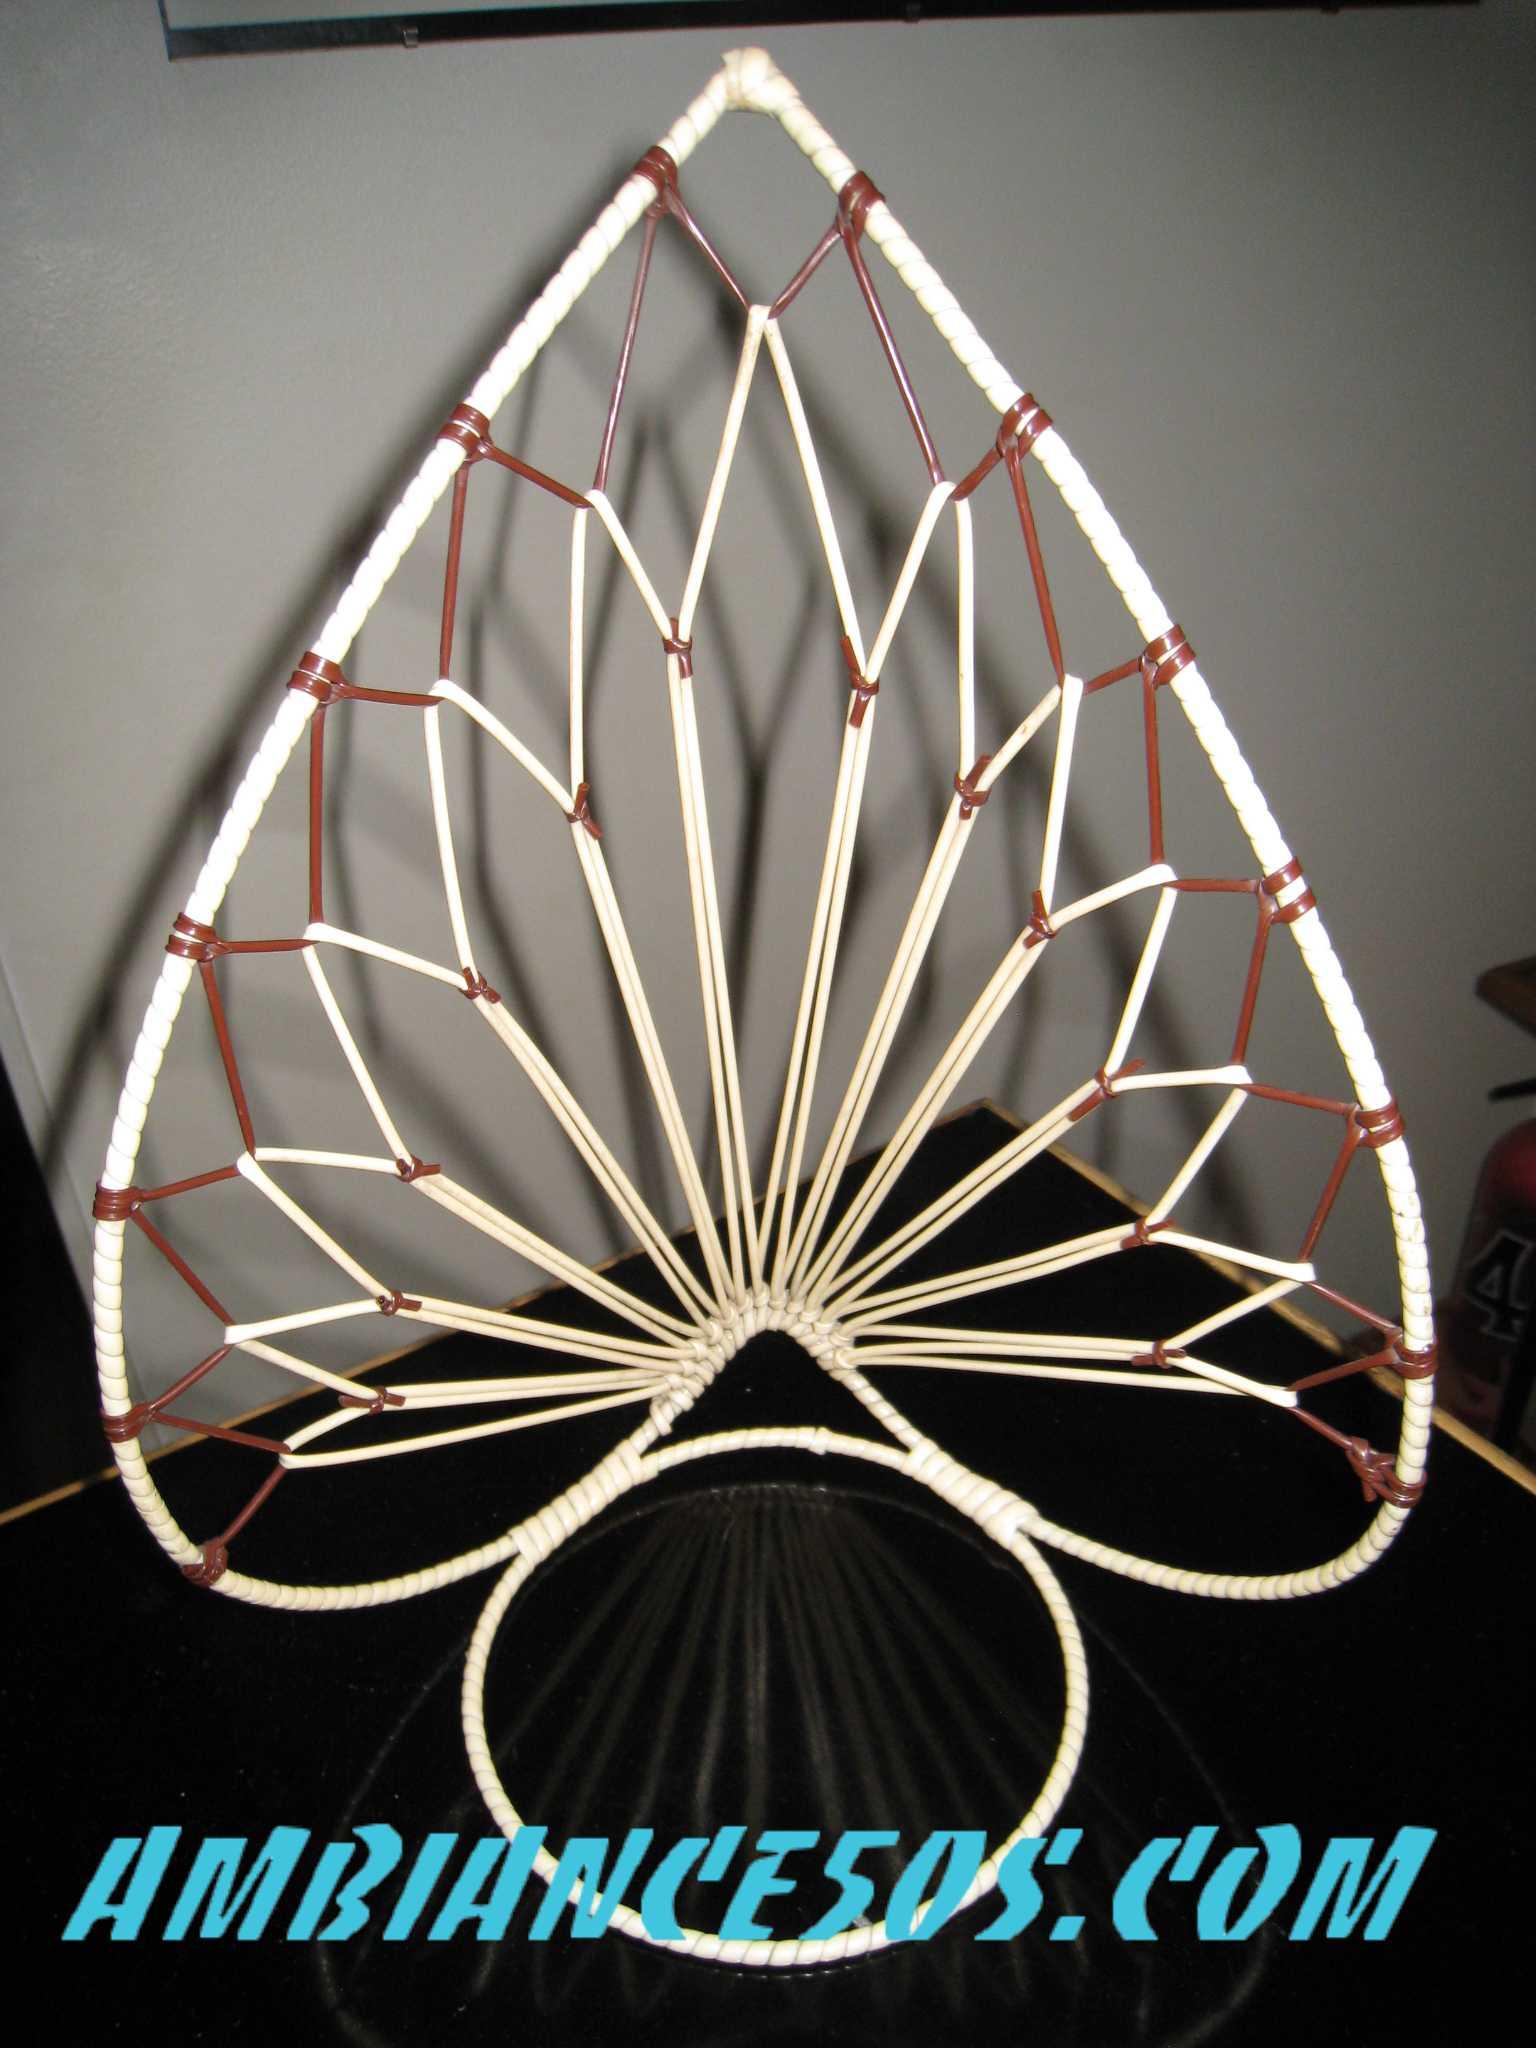 porte plante mural id e inspirante pour la conception de la maison. Black Bedroom Furniture Sets. Home Design Ideas